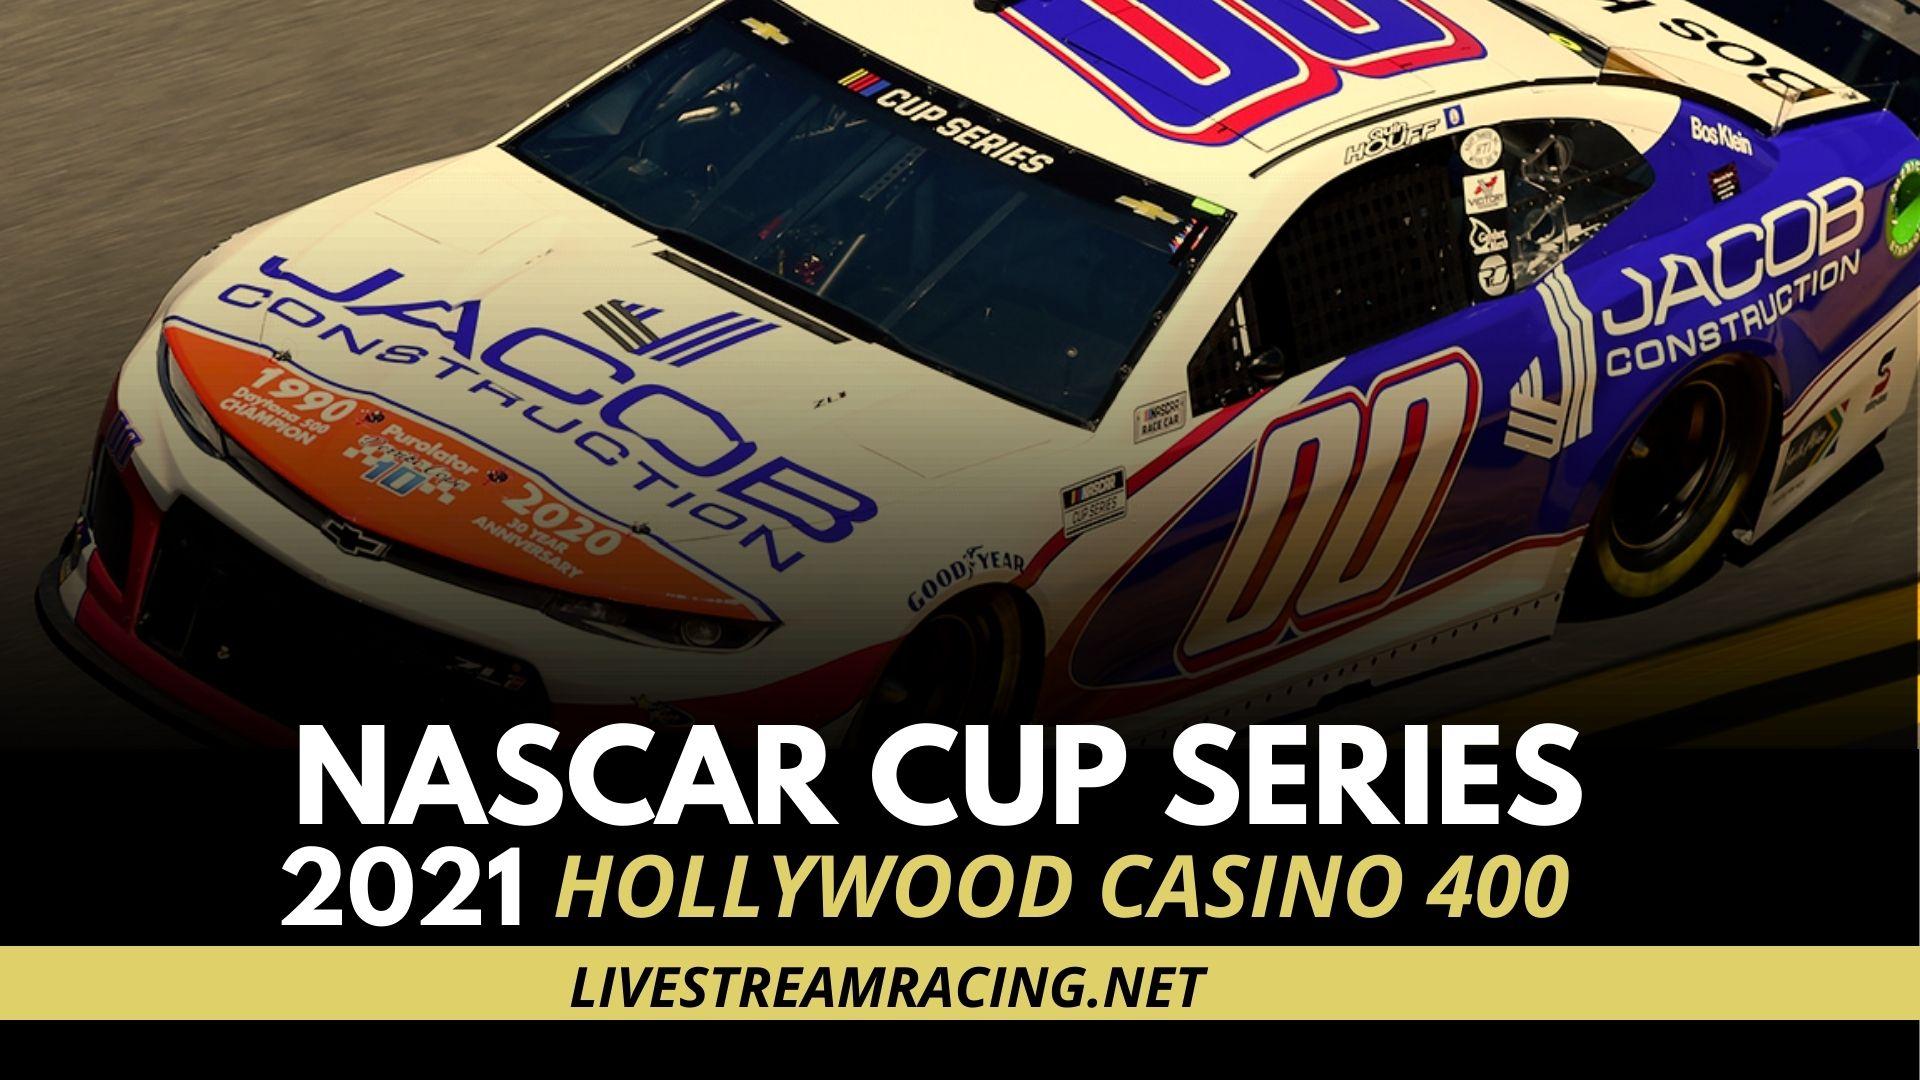 Nascar Hollywood Casino 400 Live Stream 2021 - Cup Series